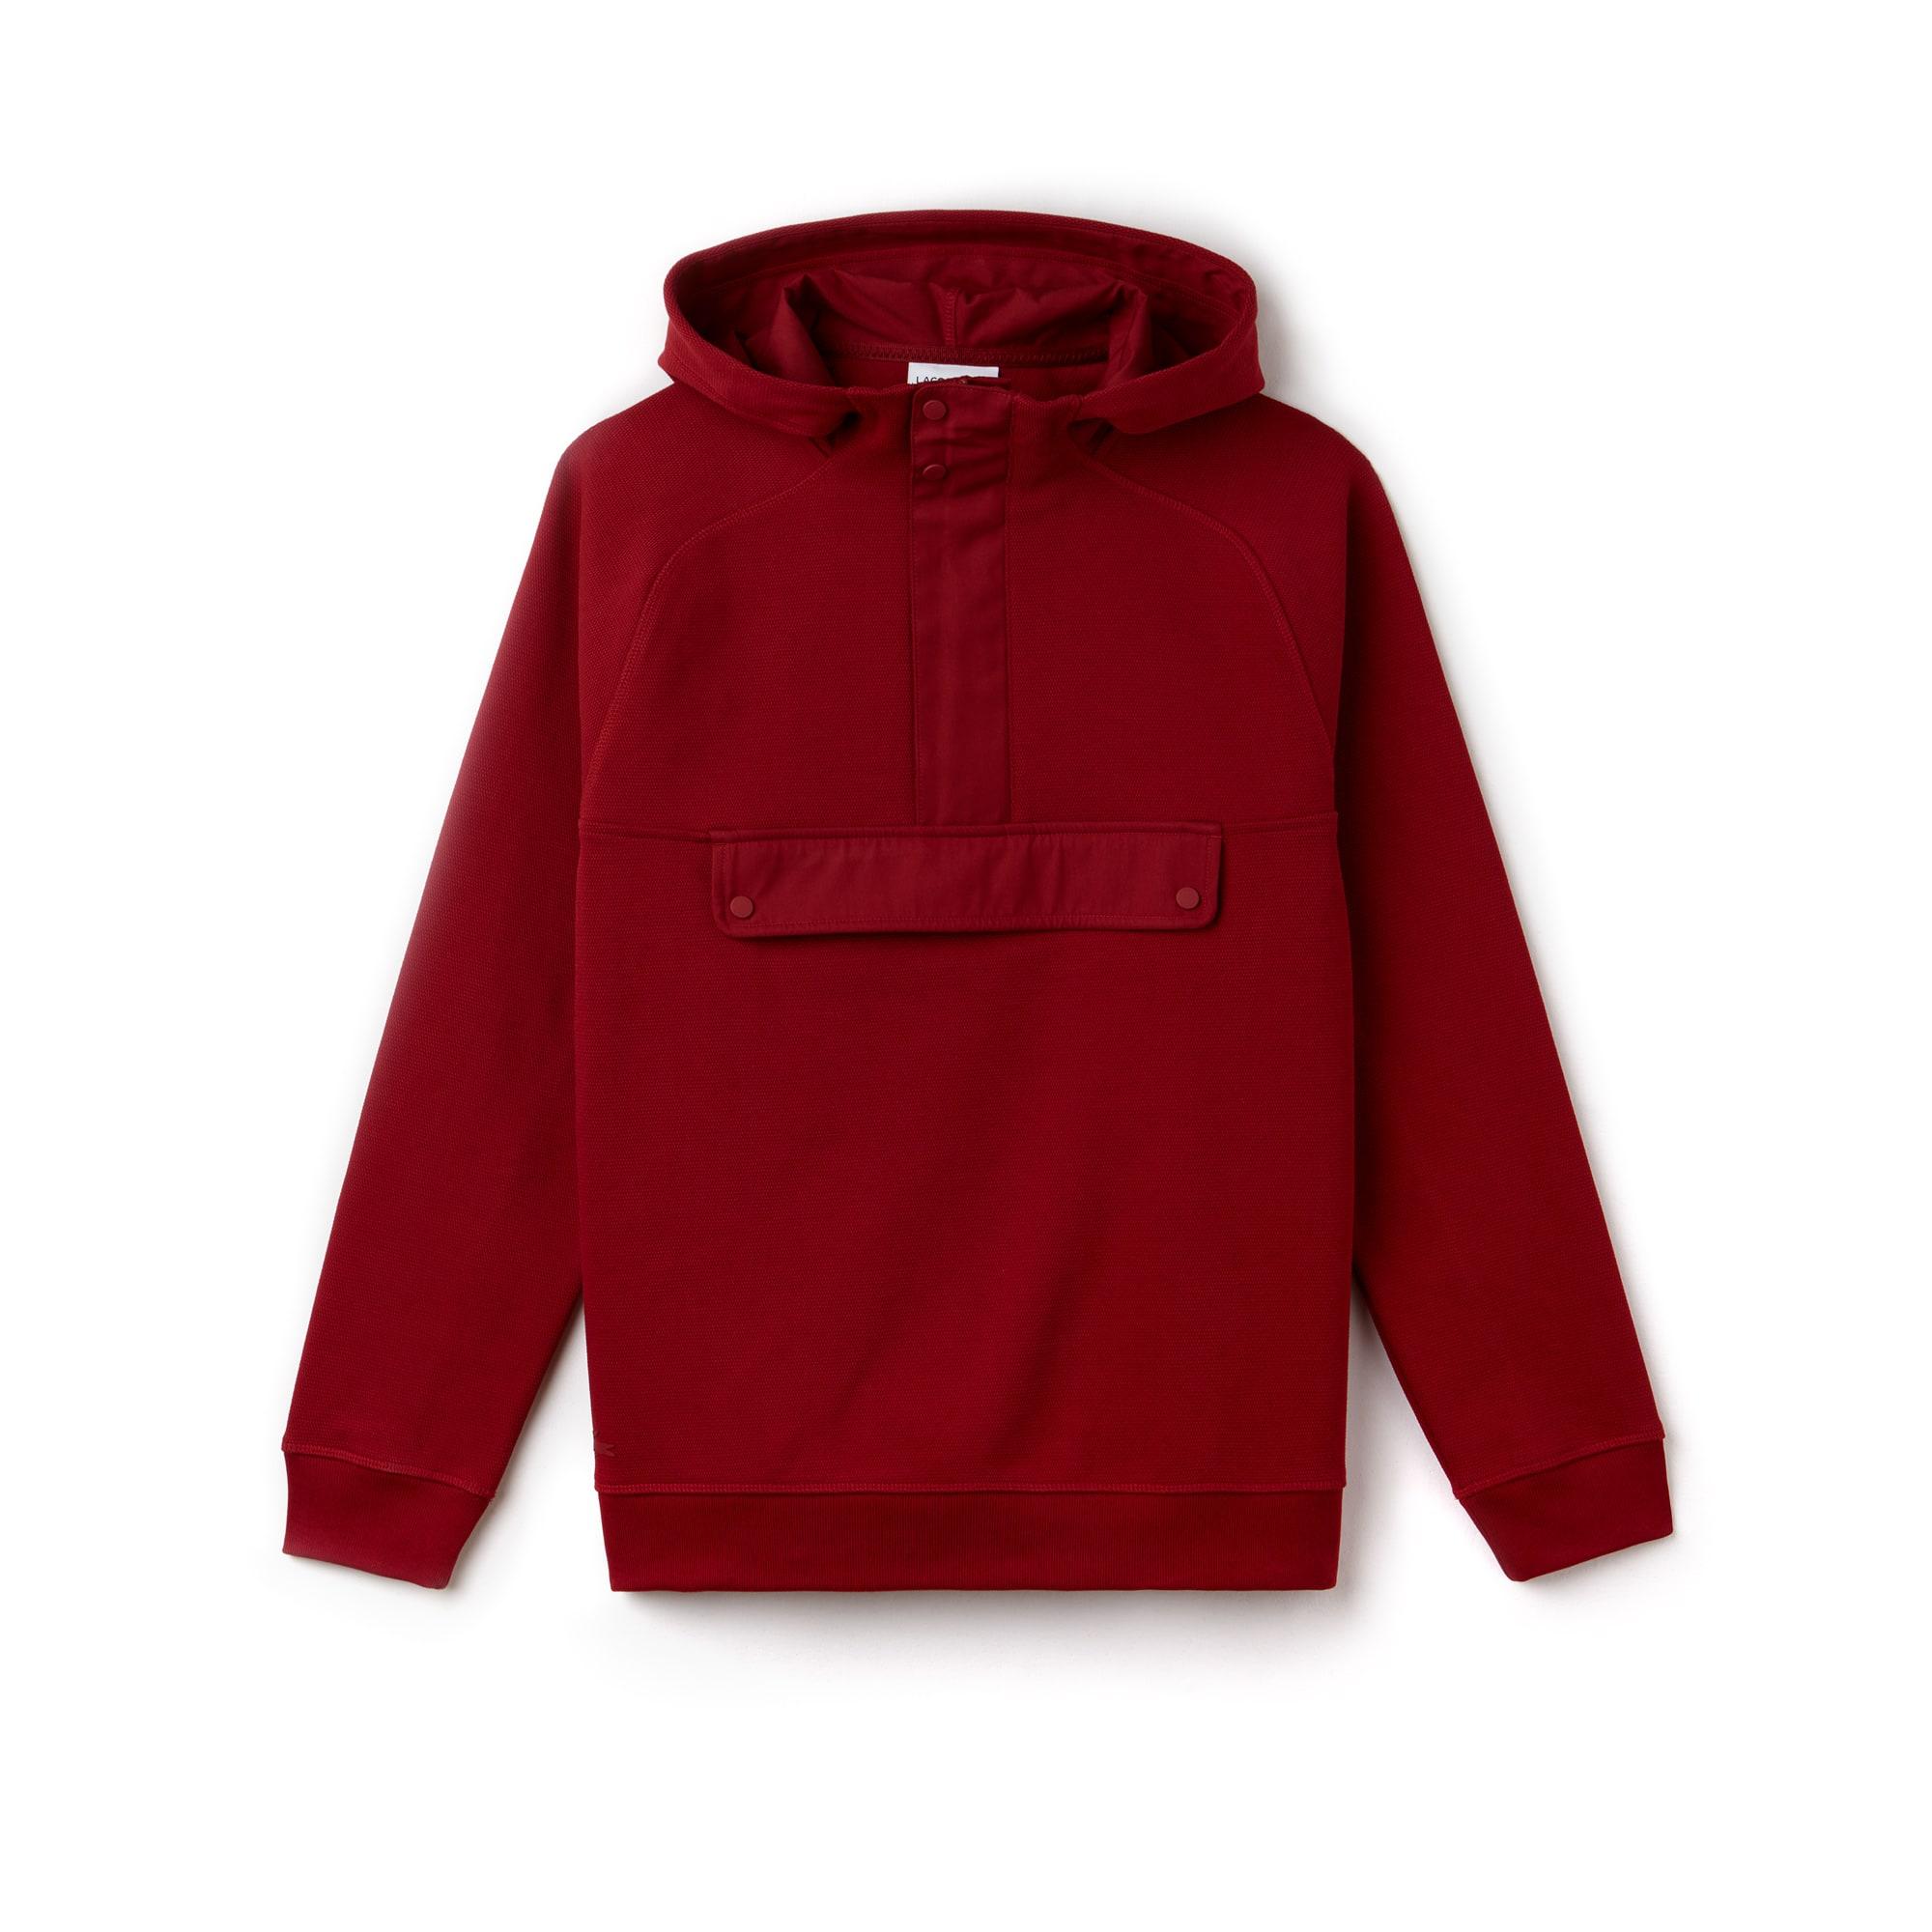 Herren-Sweatshirt aus Baumwoll-Jacquard-Piqué mit Kapuze